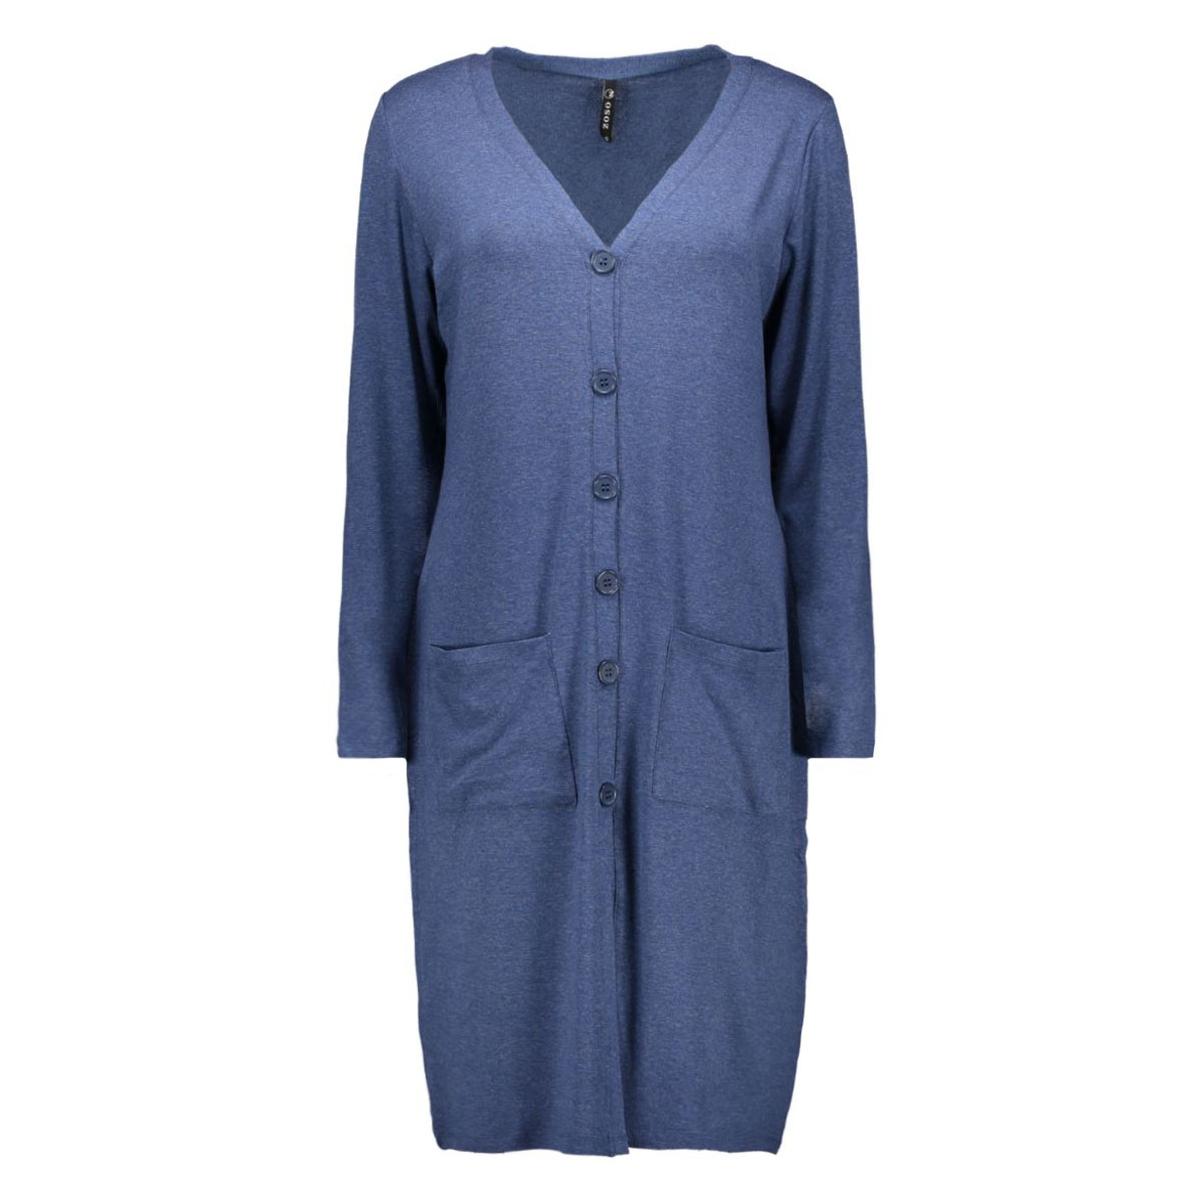 angelien zoso vest blue